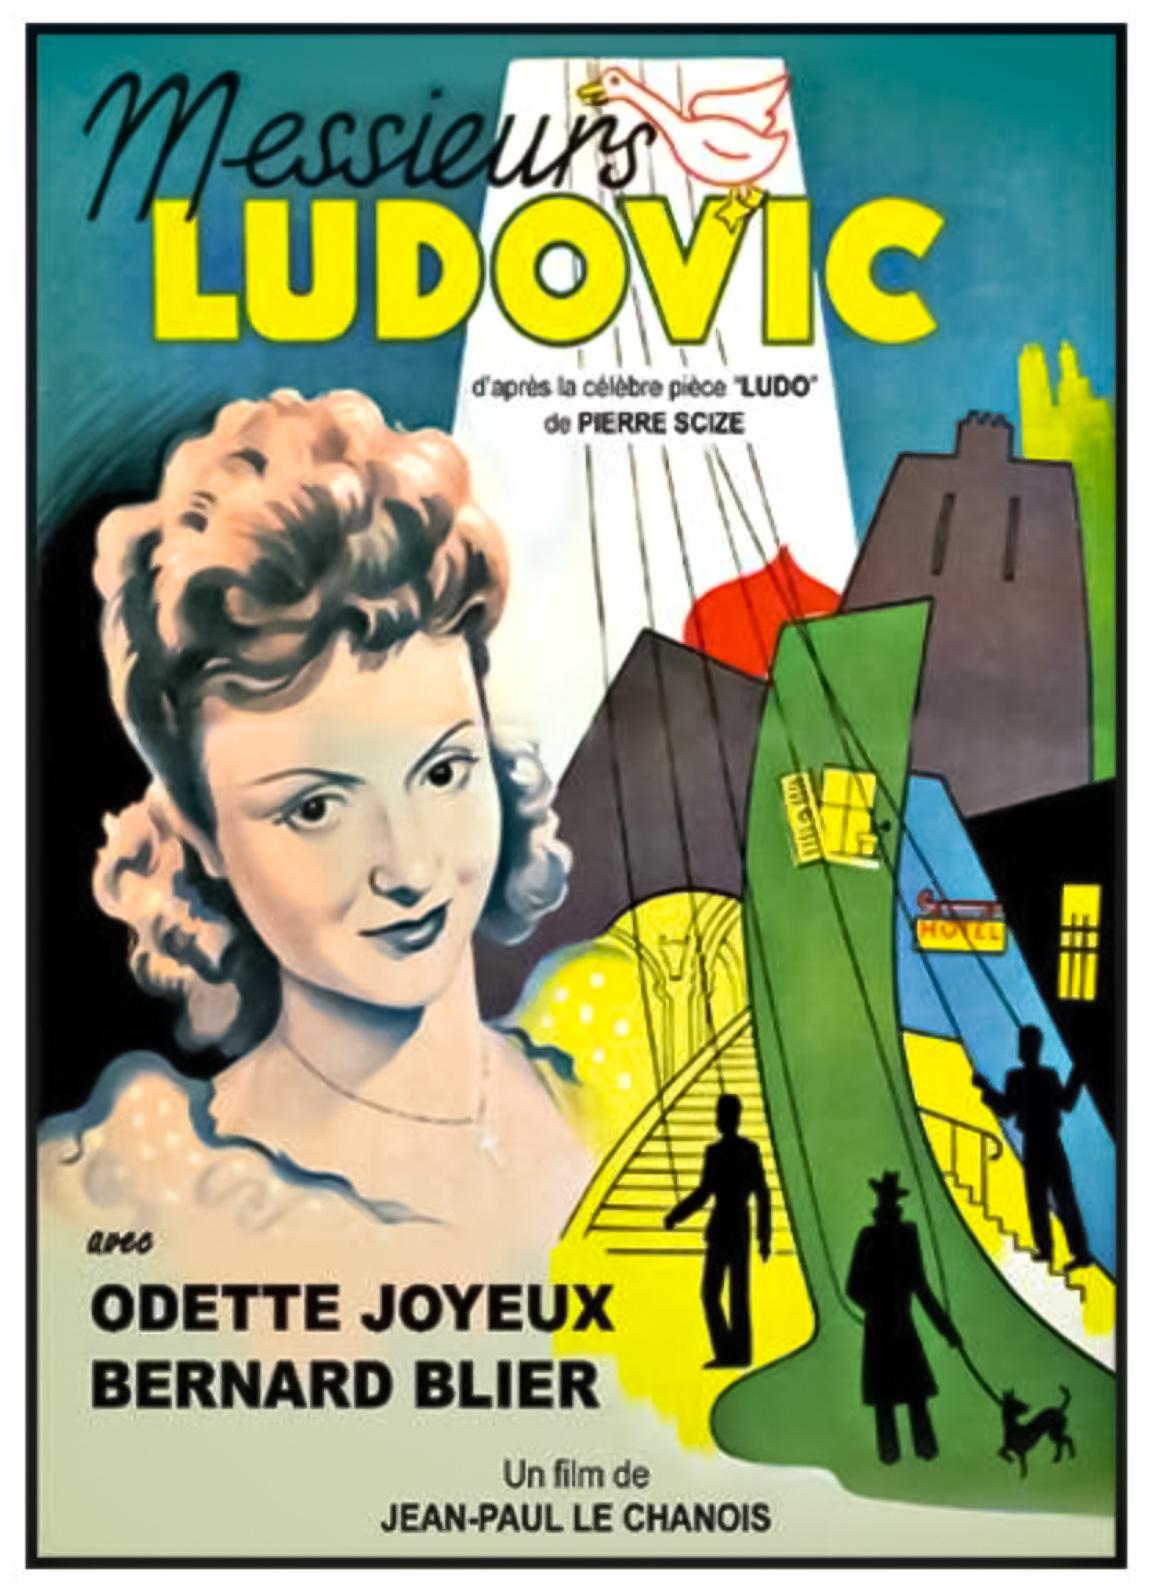 Messieurs Ludovic (1946)